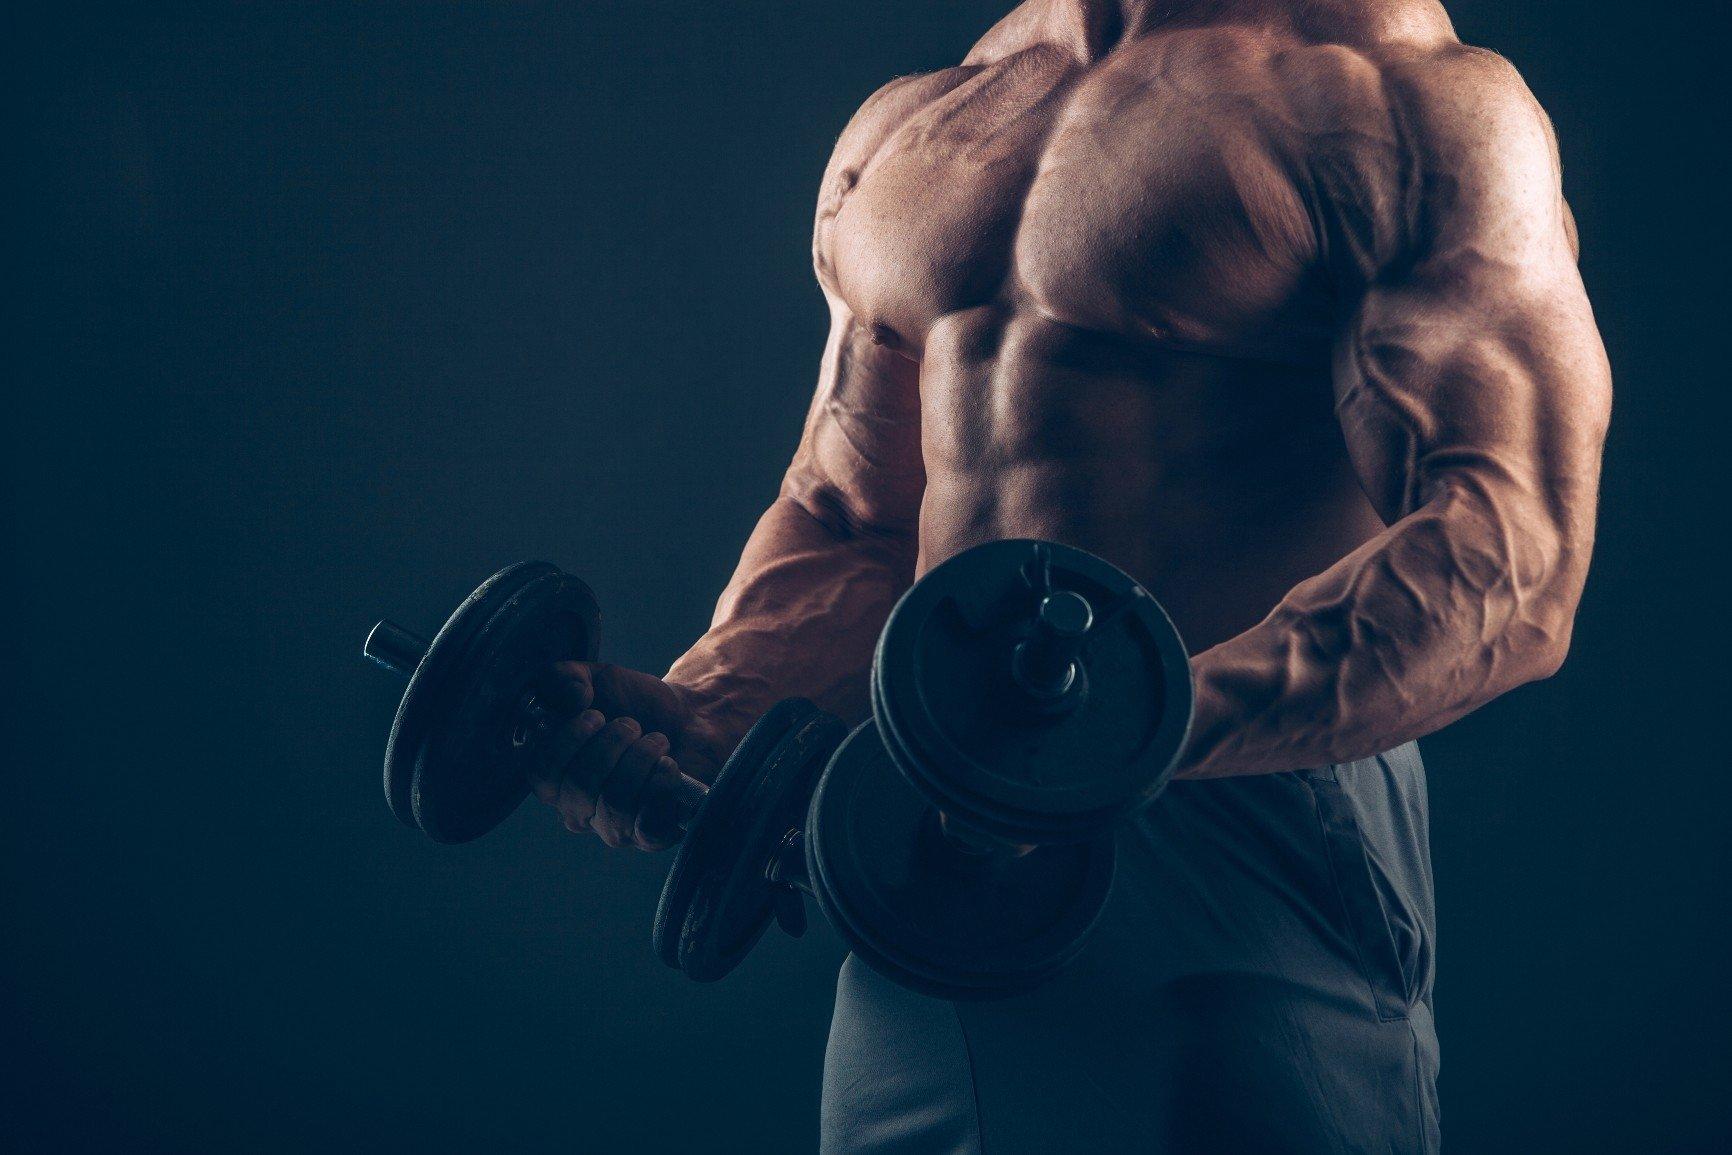 4 Bodybuilding HD Wallpapers